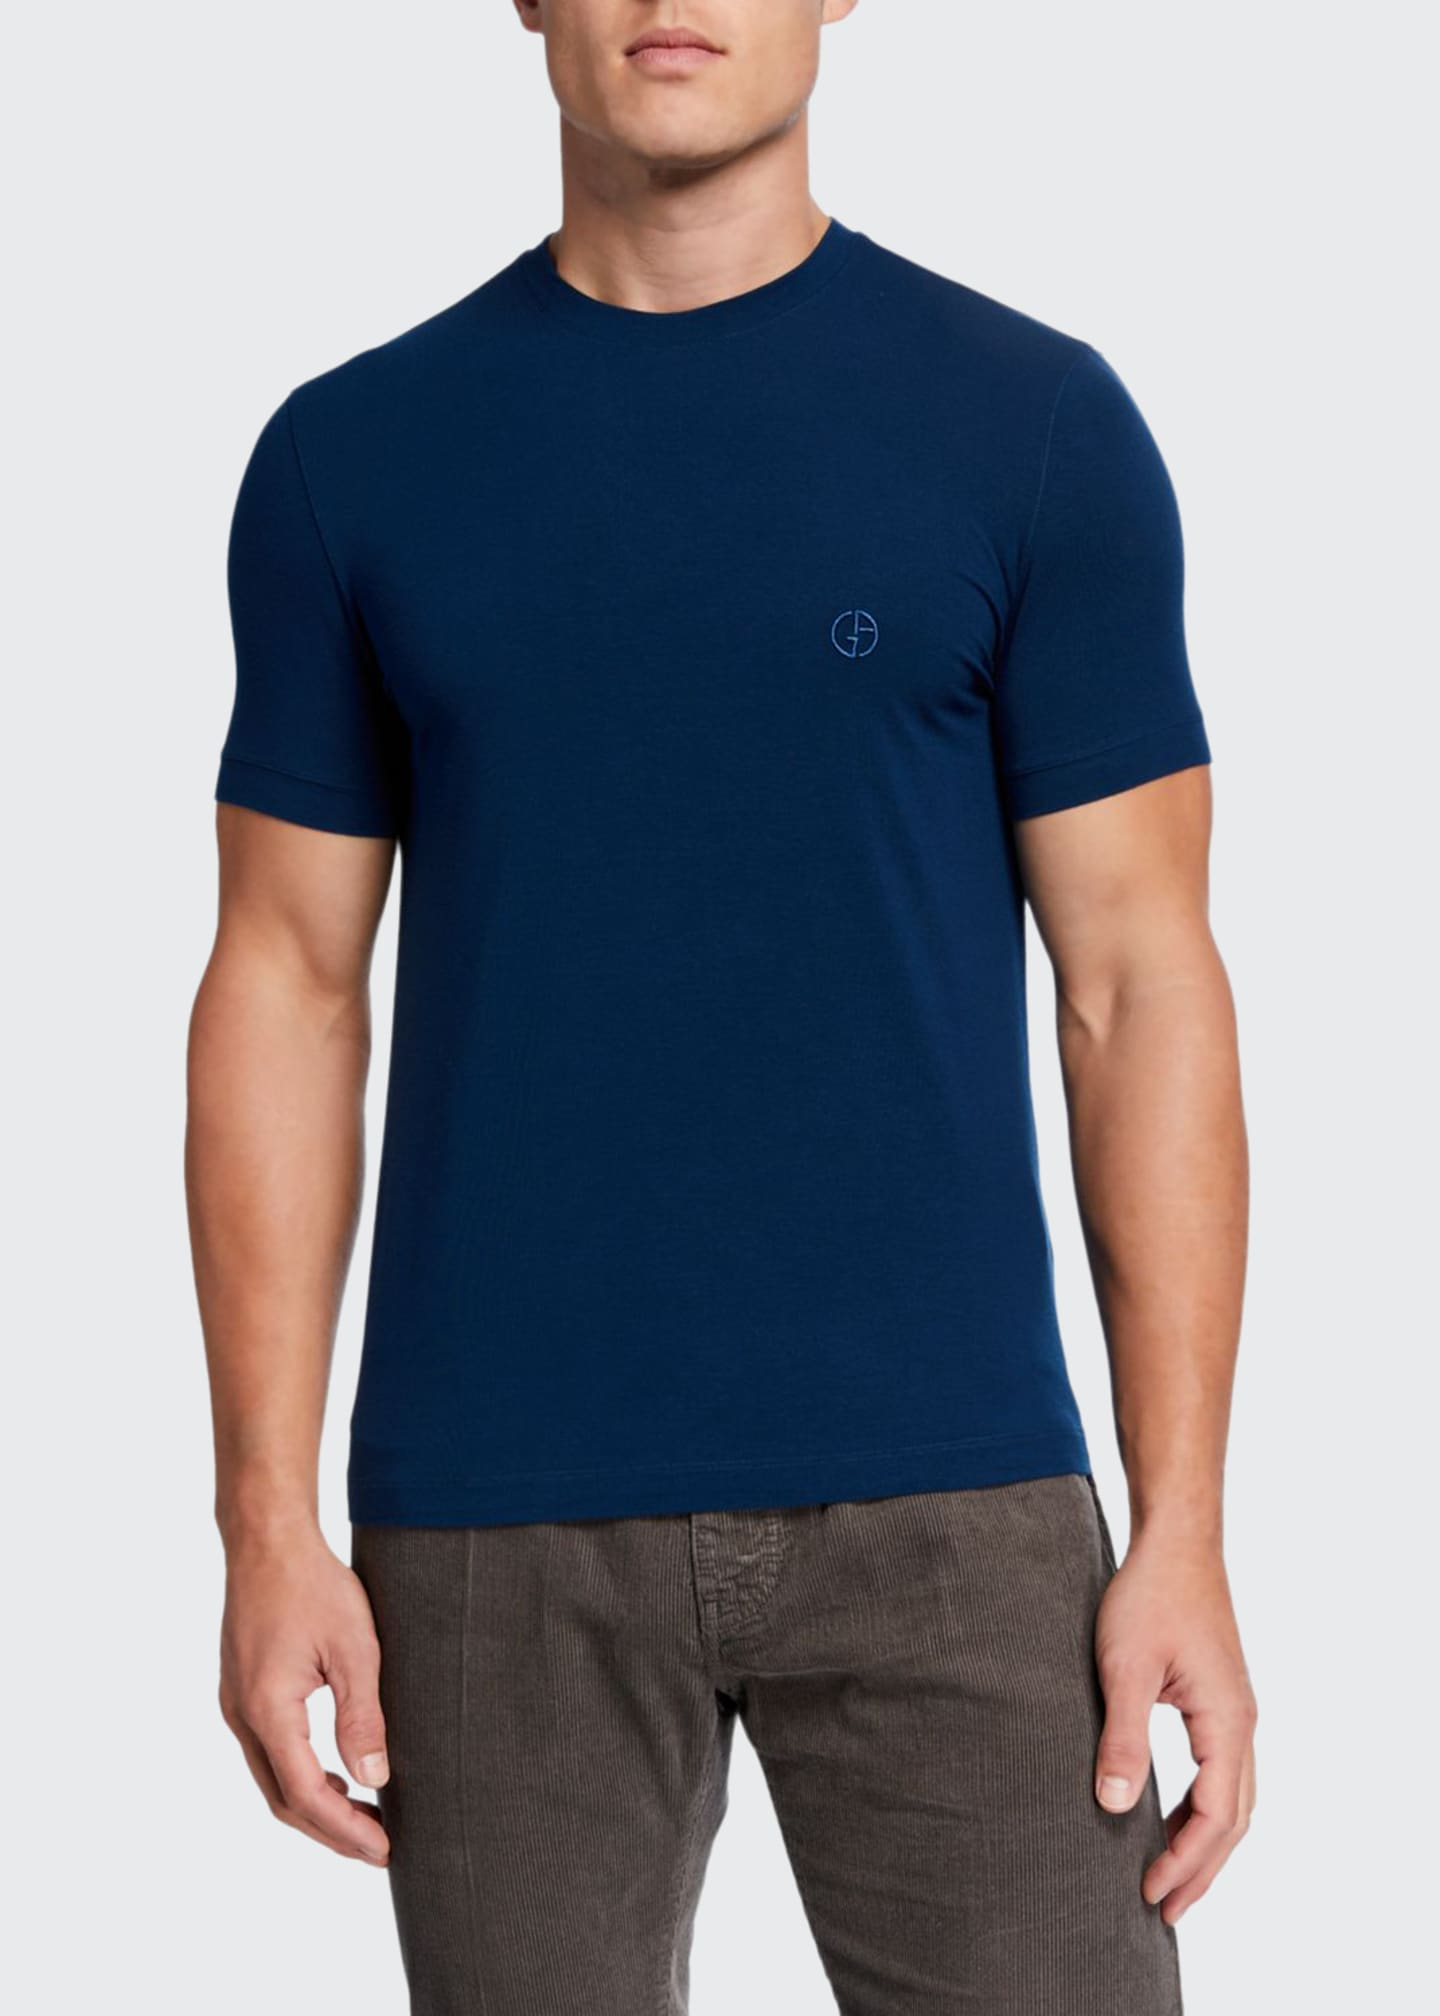 Giorgio Armani Men's Jersey-Stretch Crewneck T-Shirt